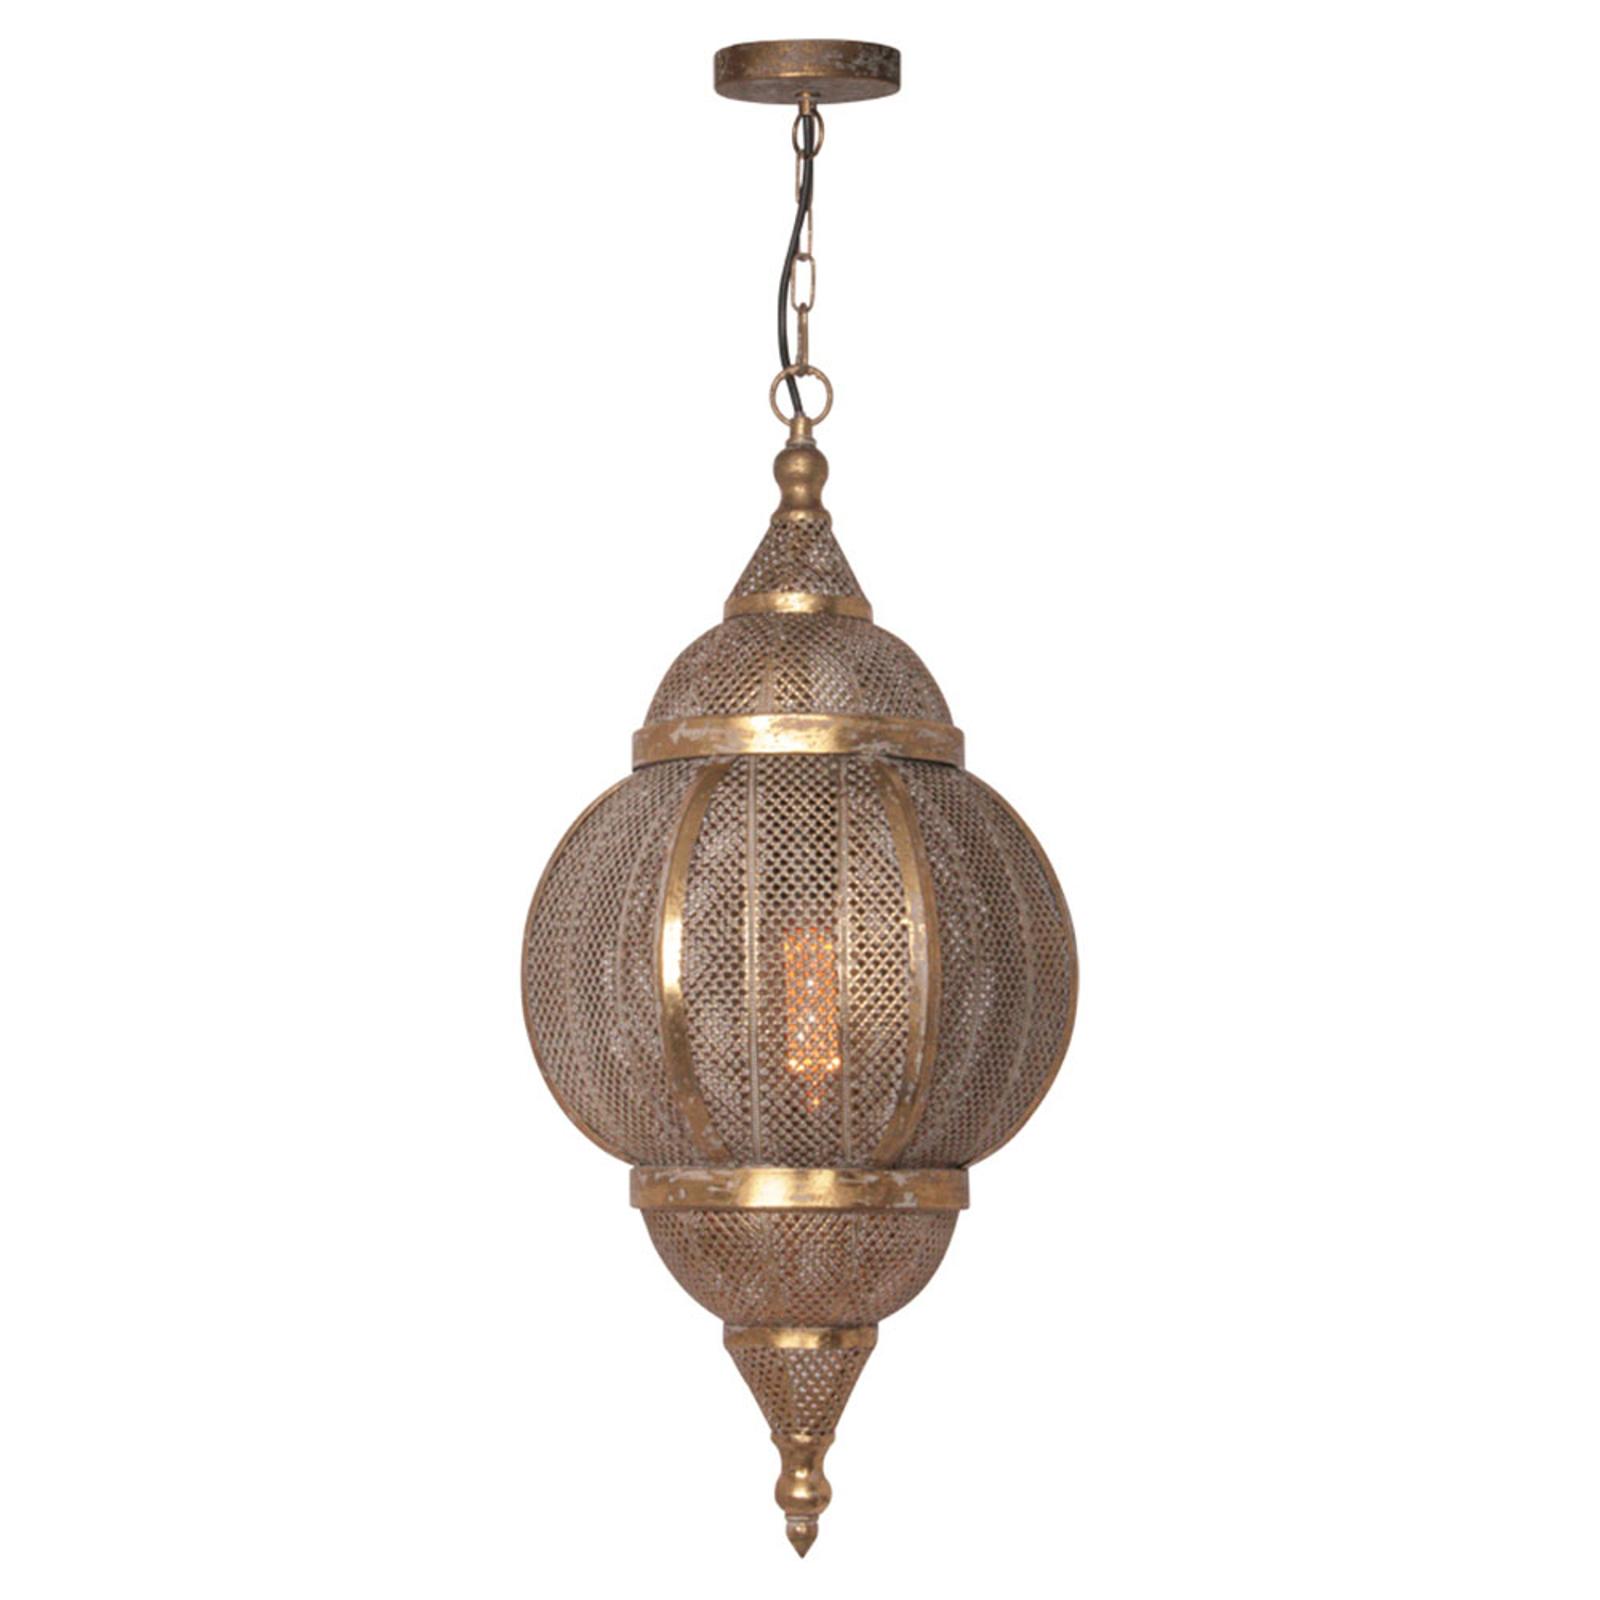 Suspension Aladino au style oriental Ø 28cm